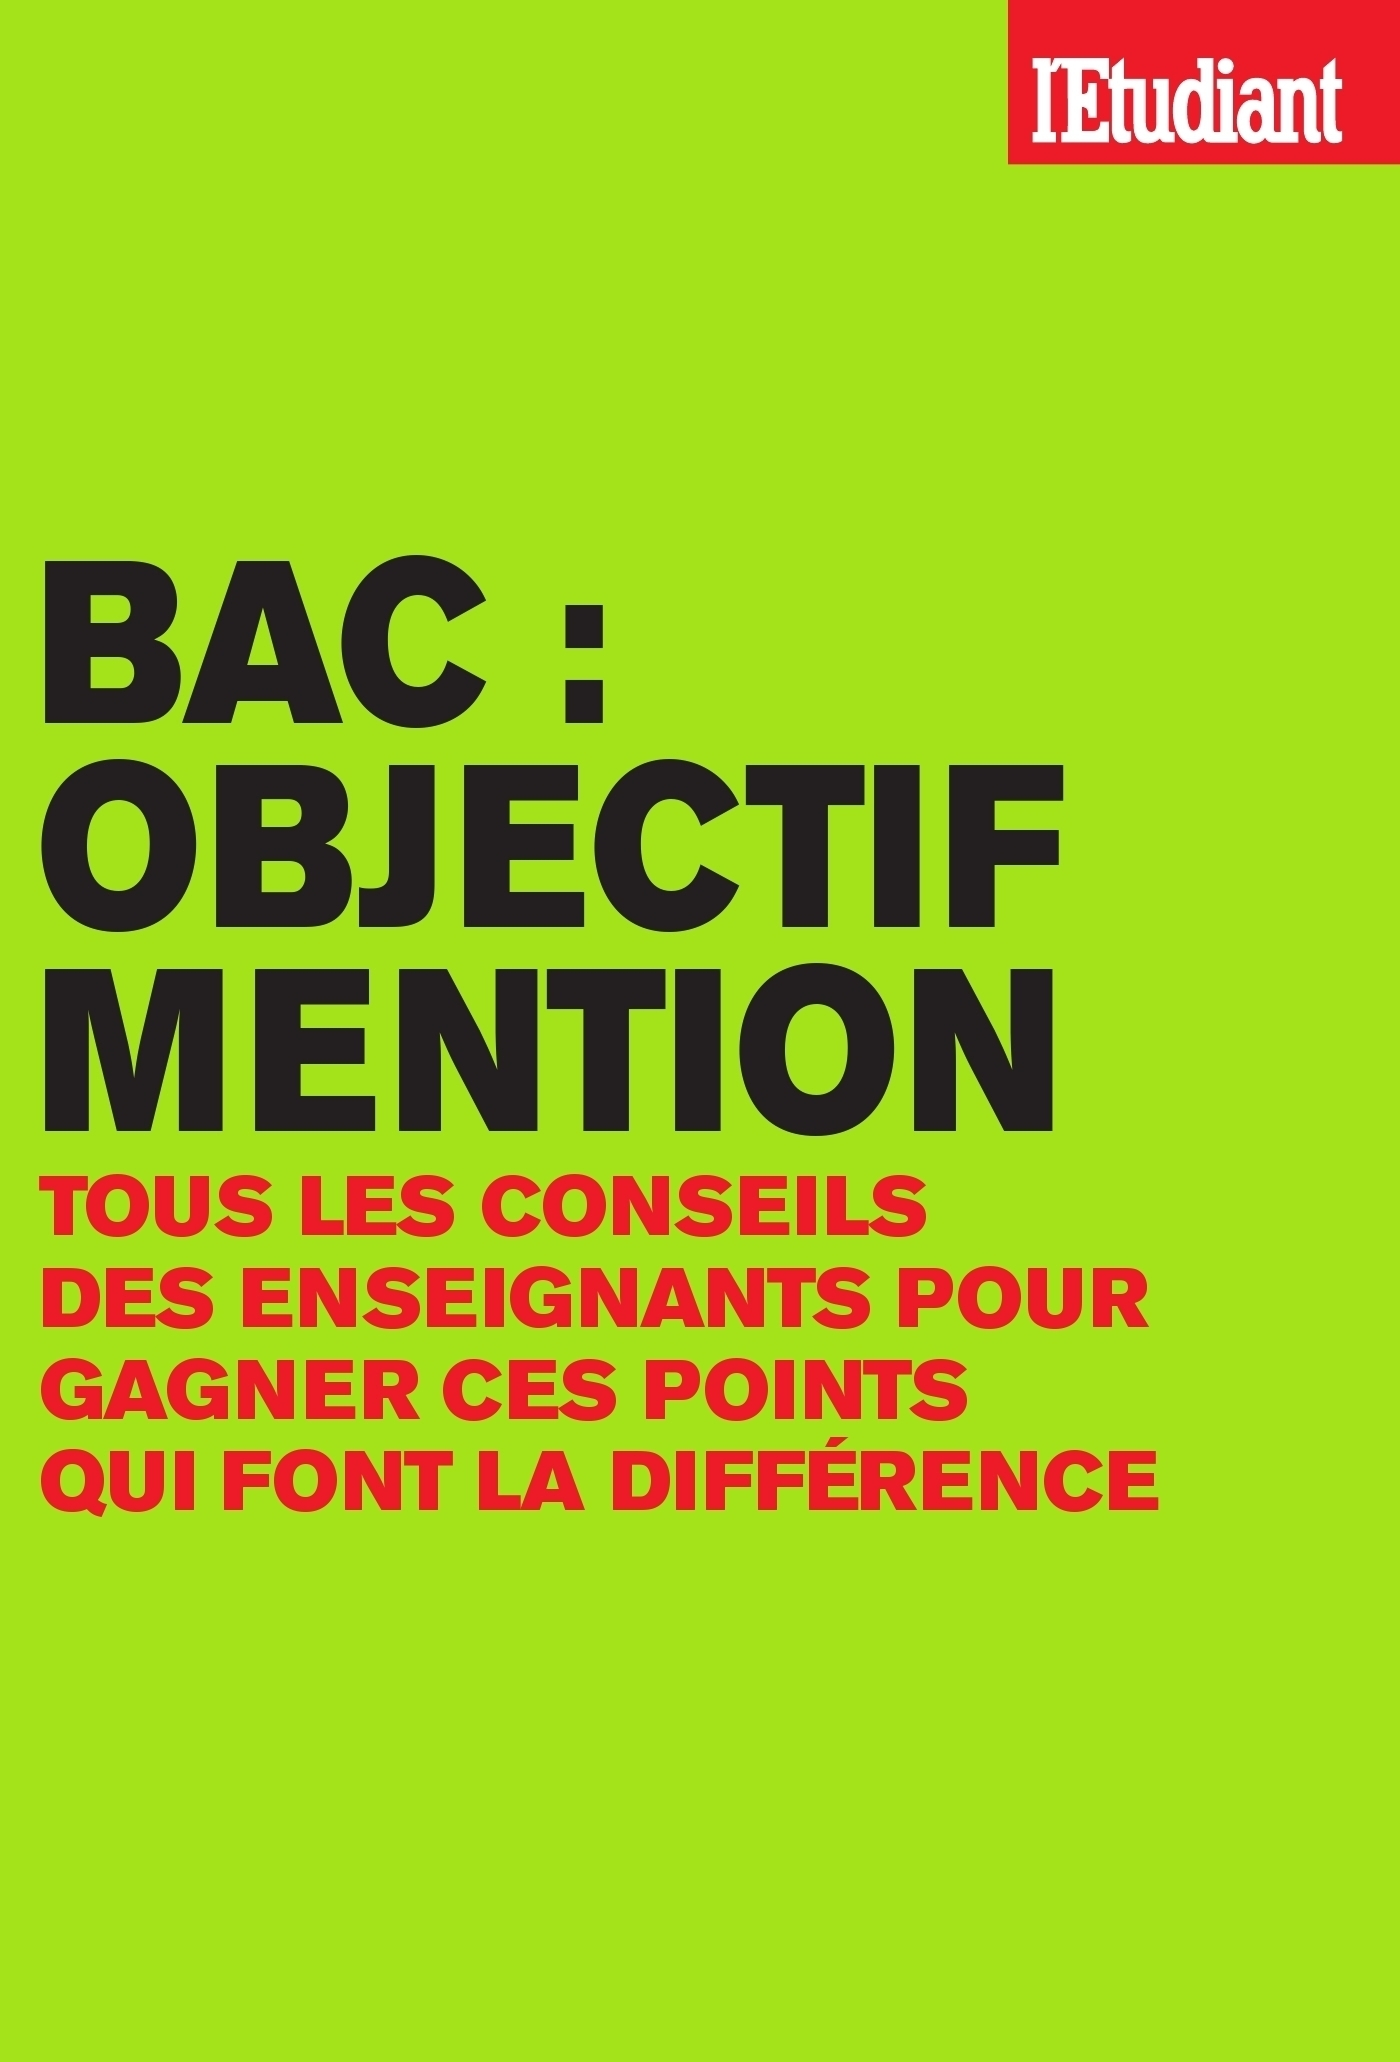 Bac : objectif mention (ebook)